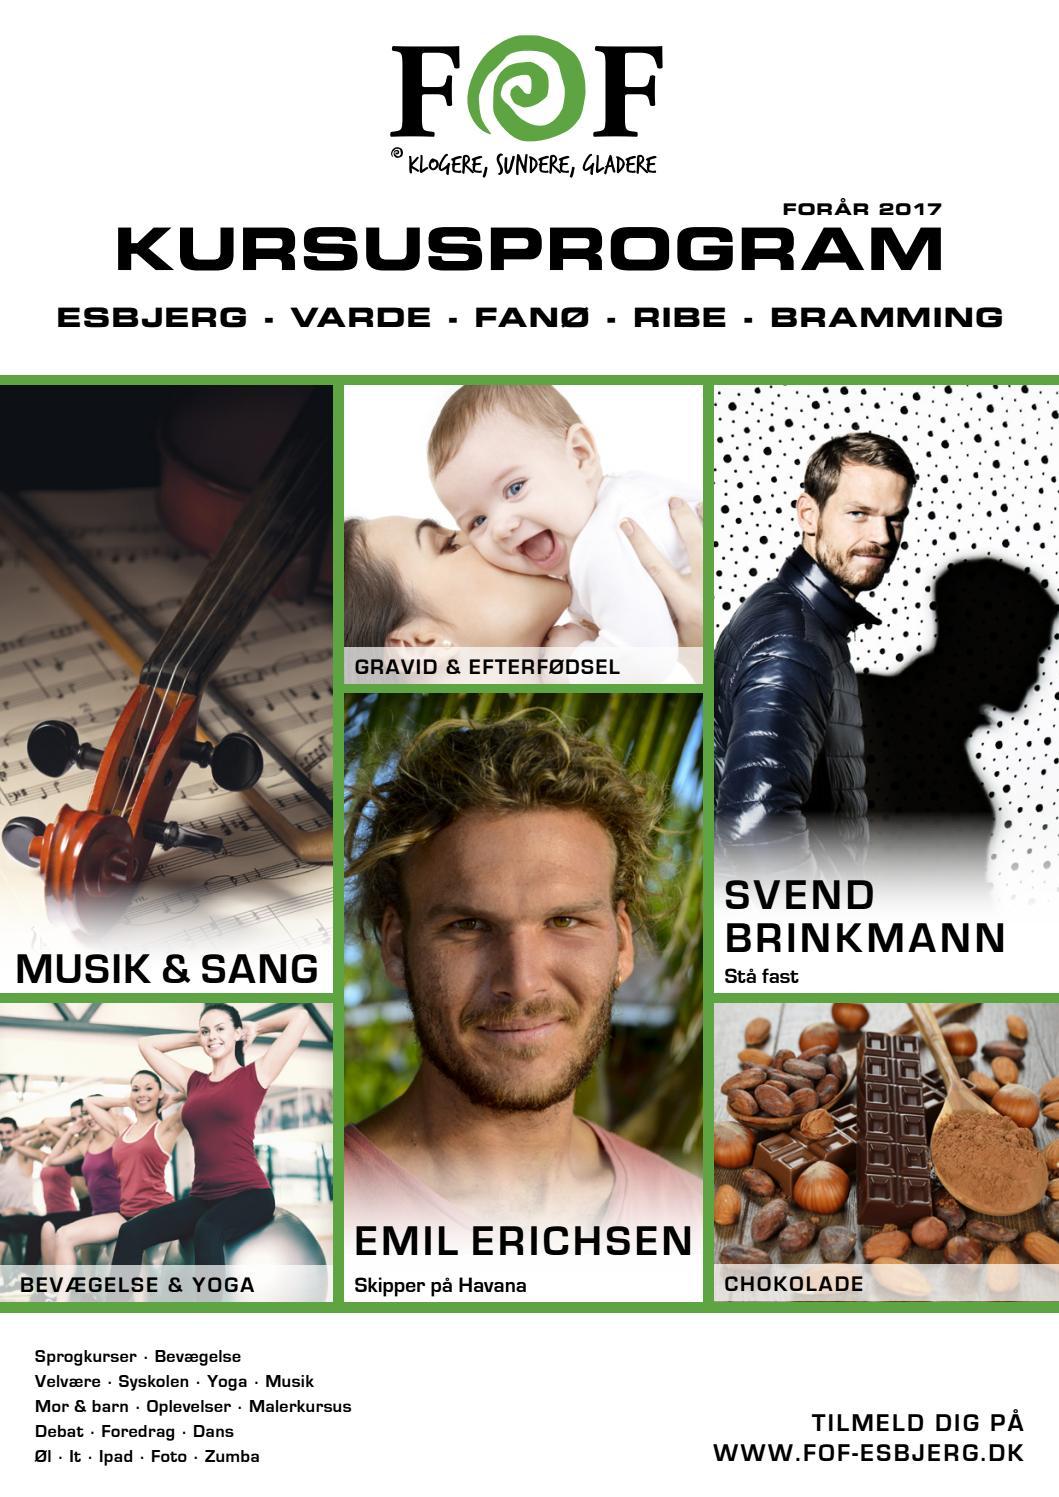 FOF Esbjerg Kursuskatalog forår 2017 by Karina Serritzlev Bekker - Issuu